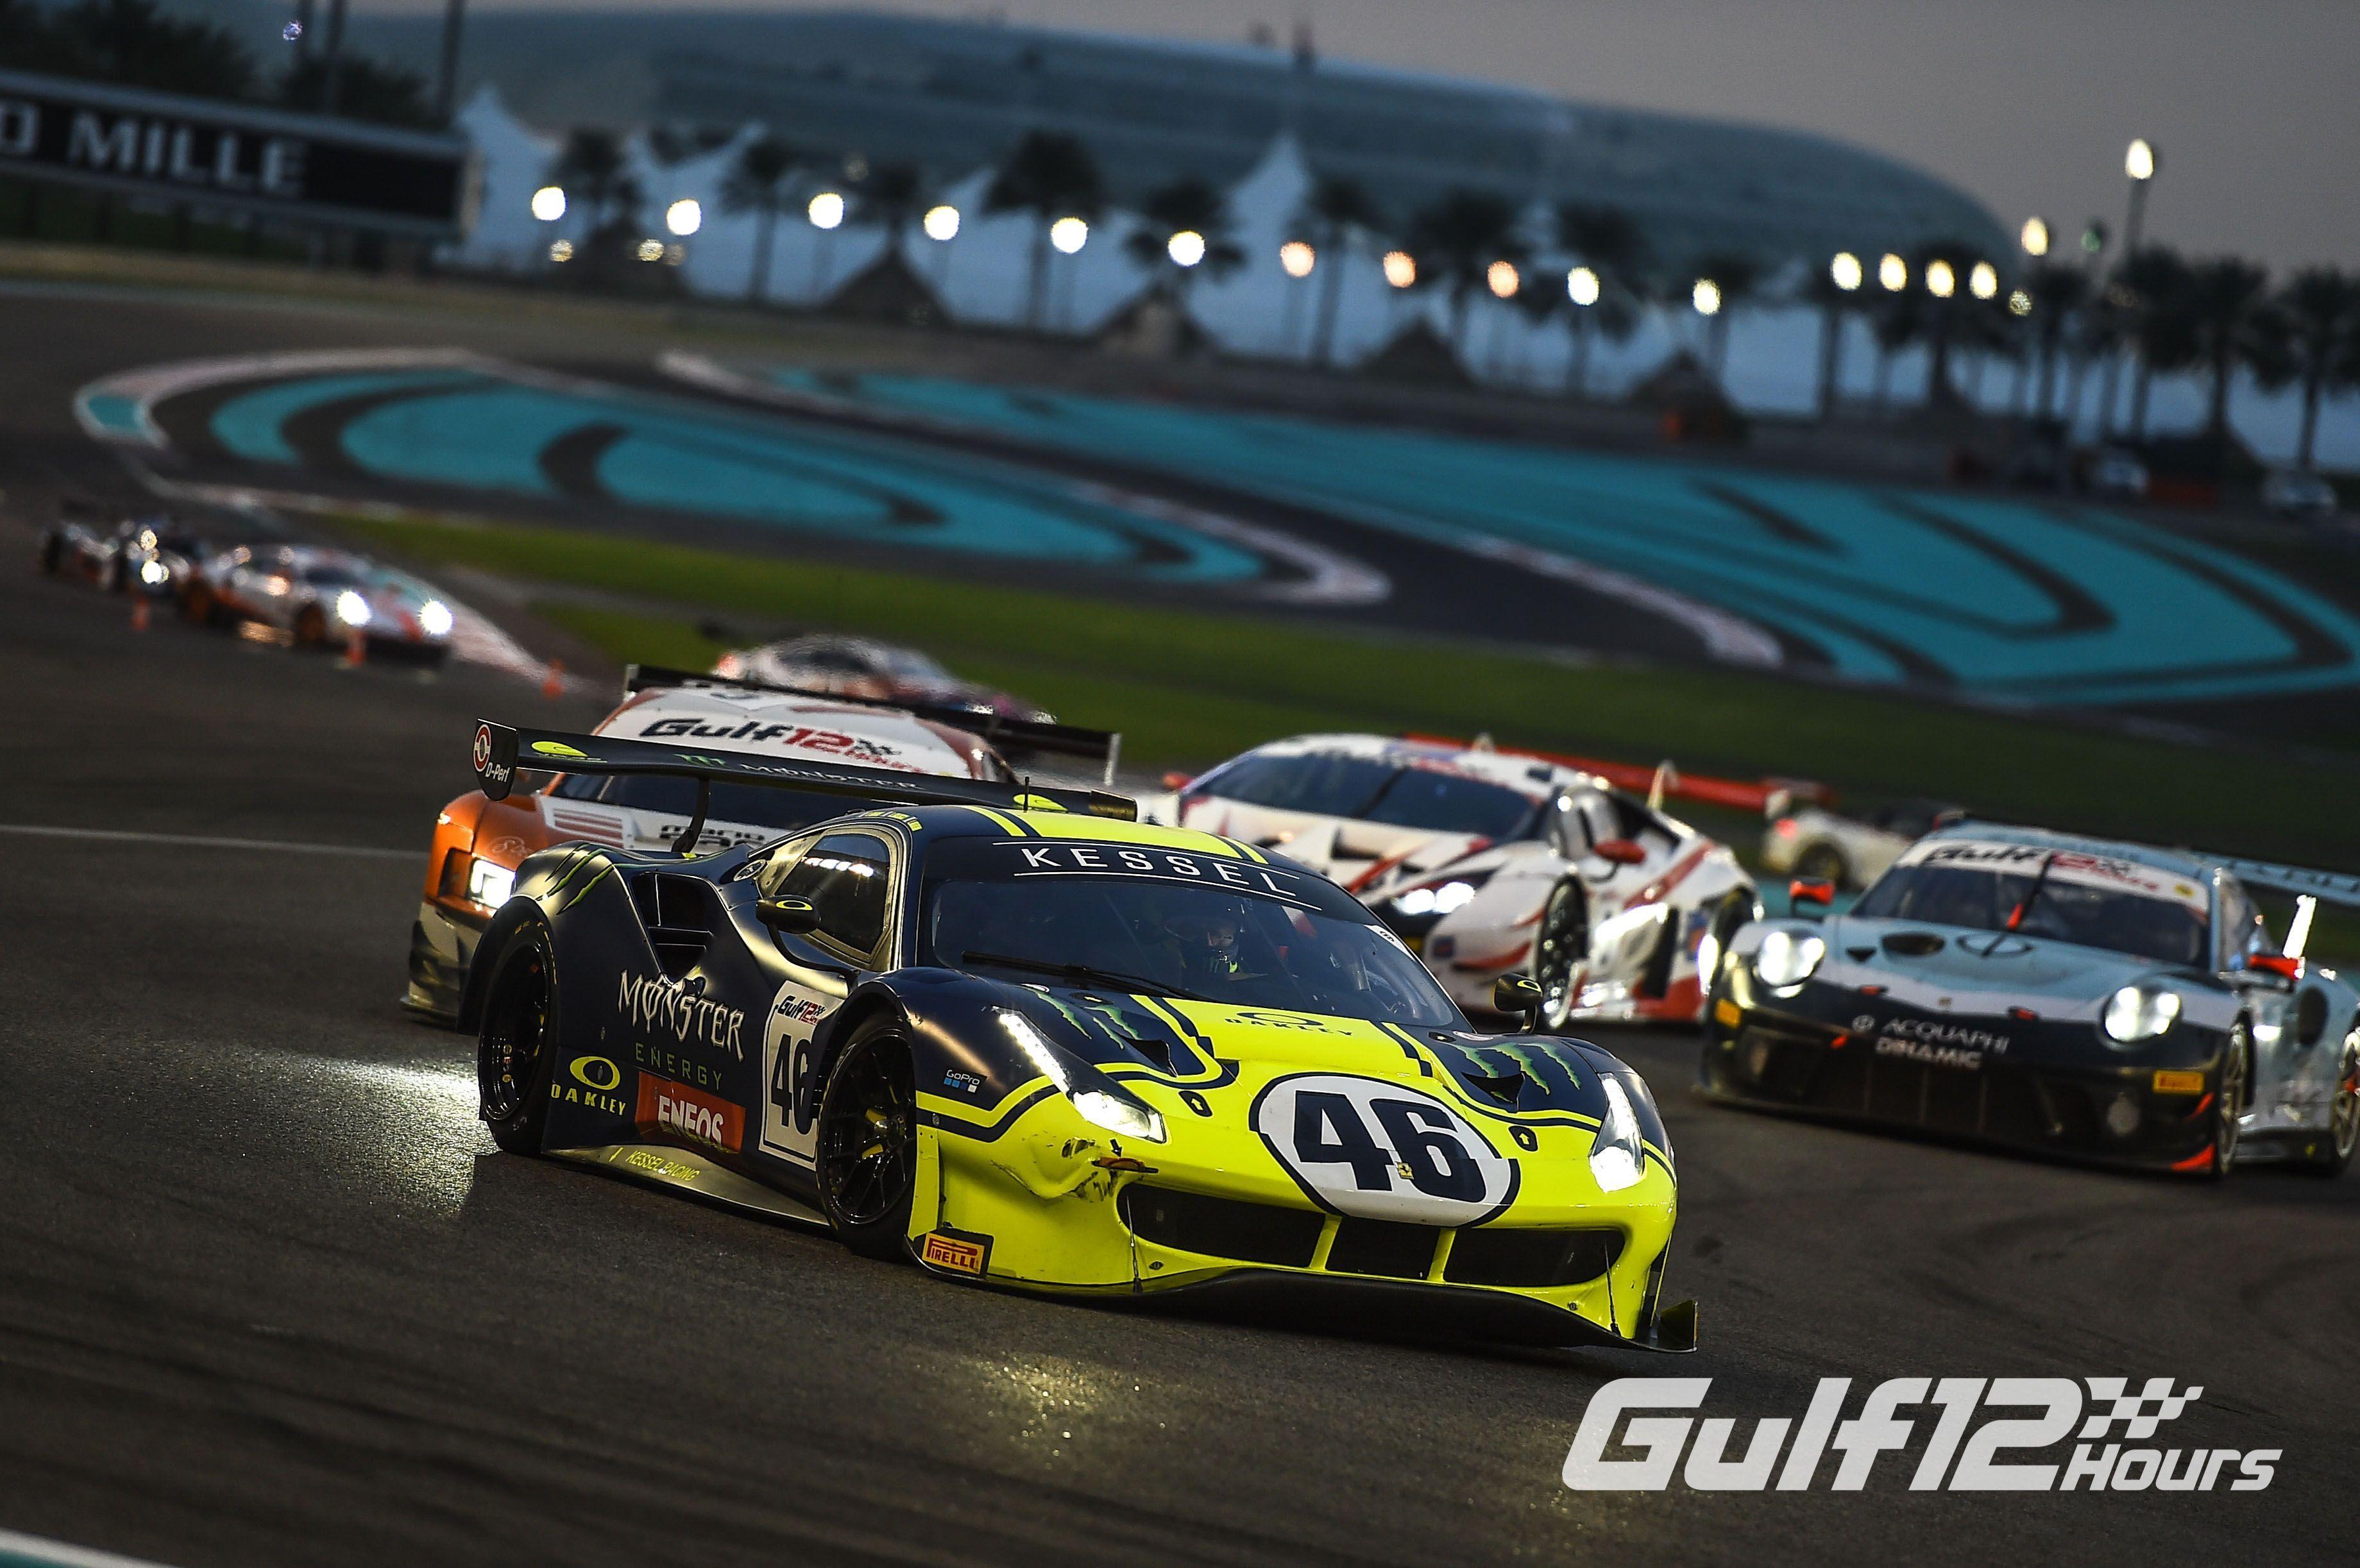 Valentino Rossi, Gulf 12 Hours